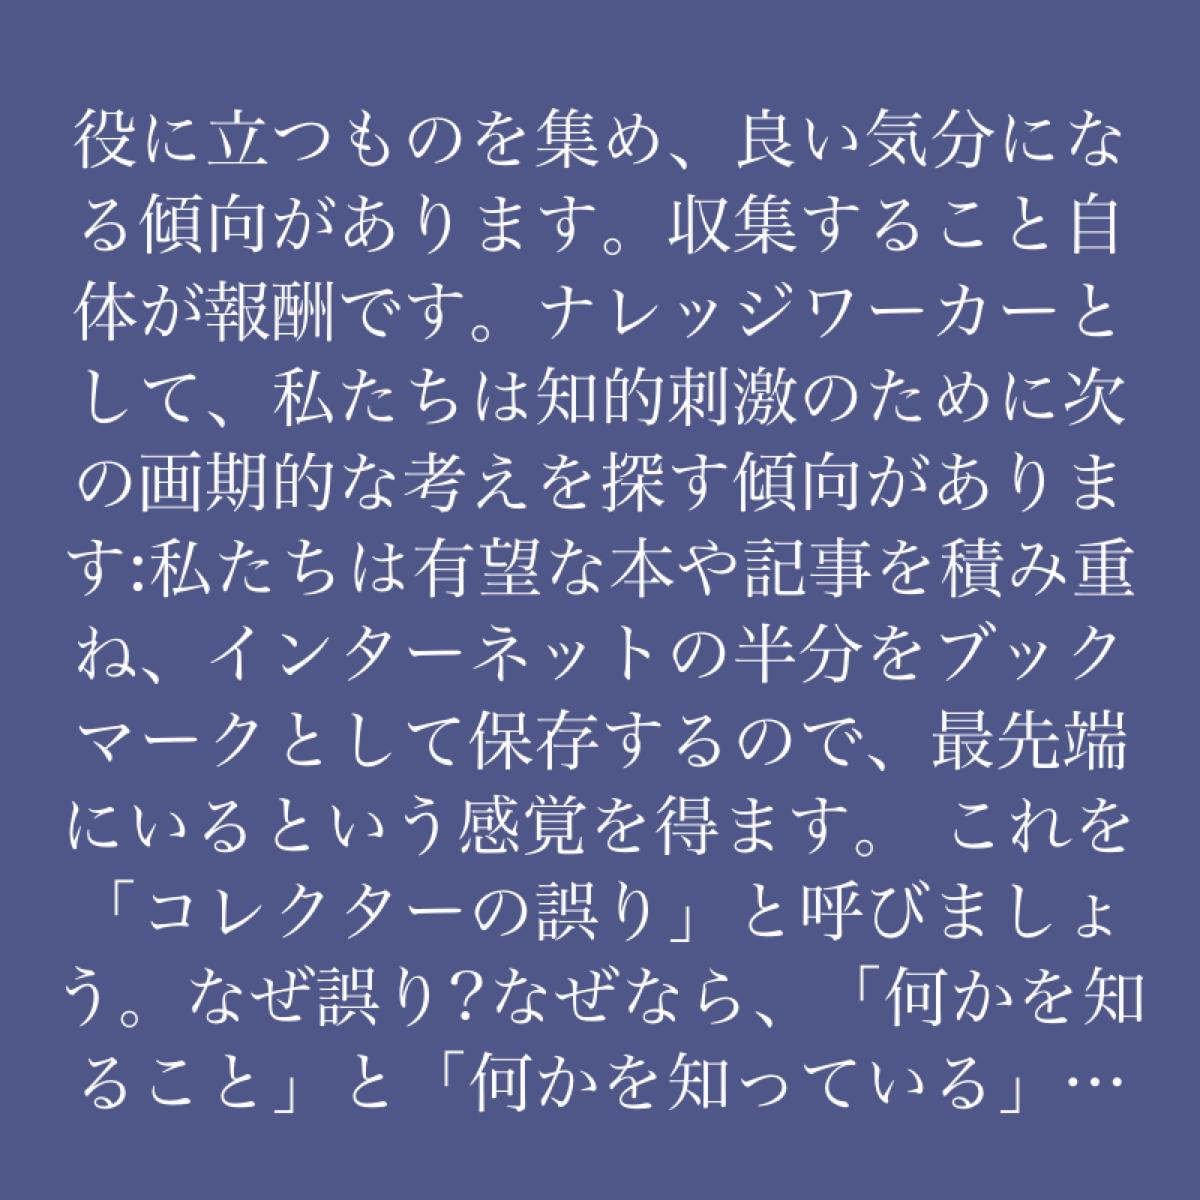 f:id:sorashima:20201125033737p:plain:w1200